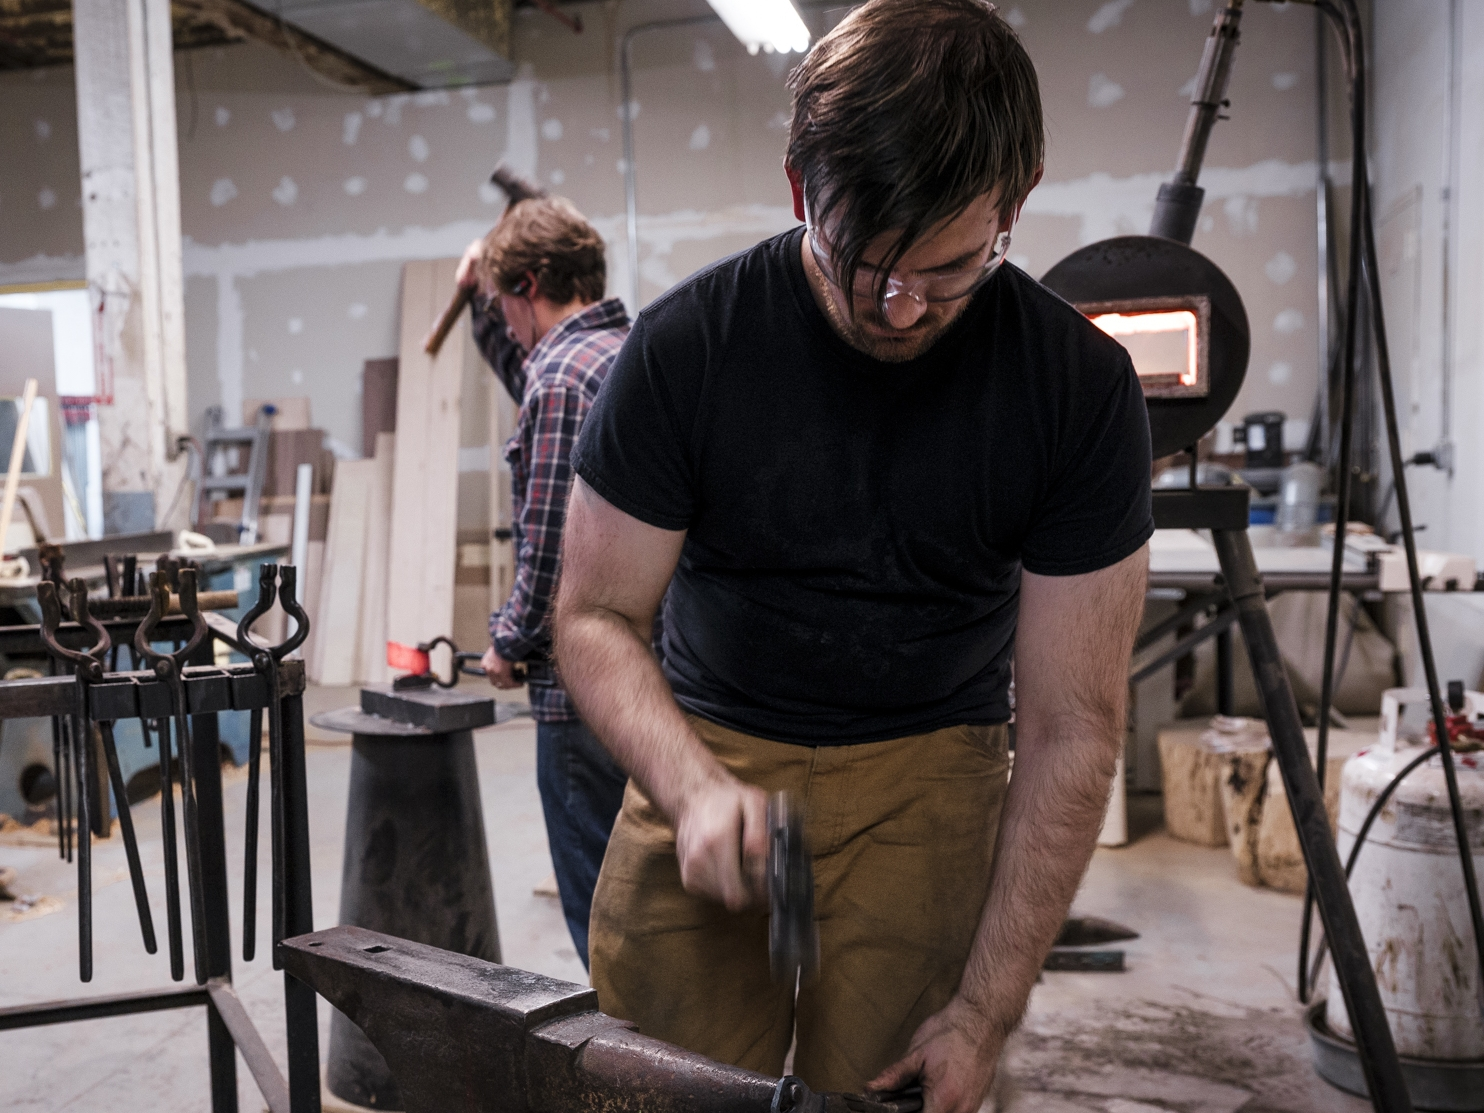 Chris Gampat Justin Kirck as a Blacksmith (39 of 41)ISO 32001-40 sec at f - 5.6.jpg